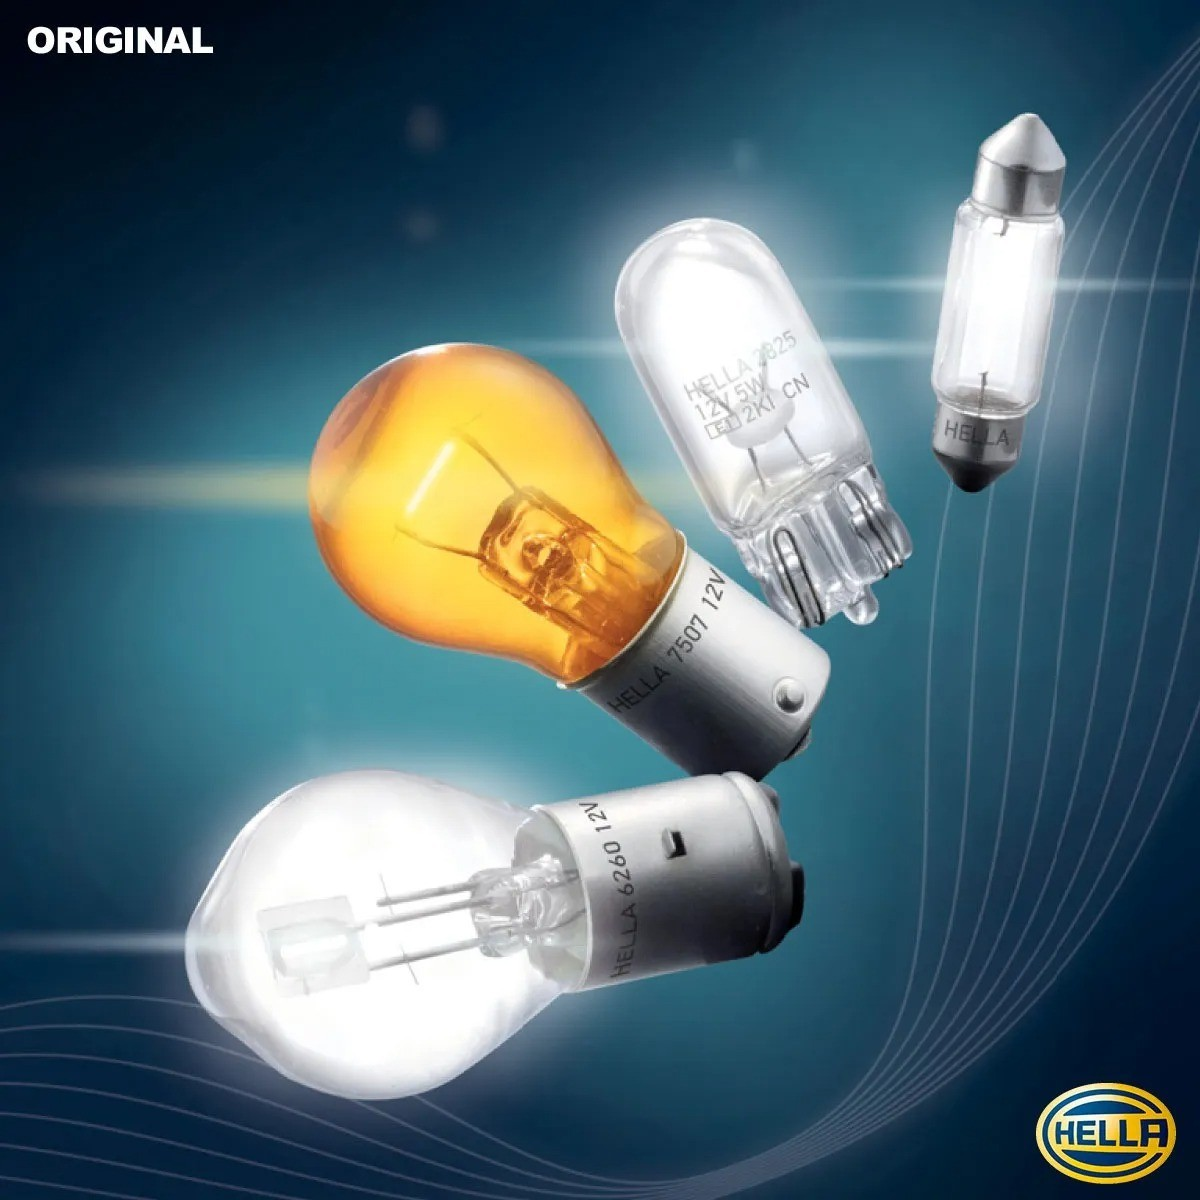 LAMPADA CONVENCIONAL 12V 12V 10W T3.25 31MM TORPEDO UNIVERSAL HELLA